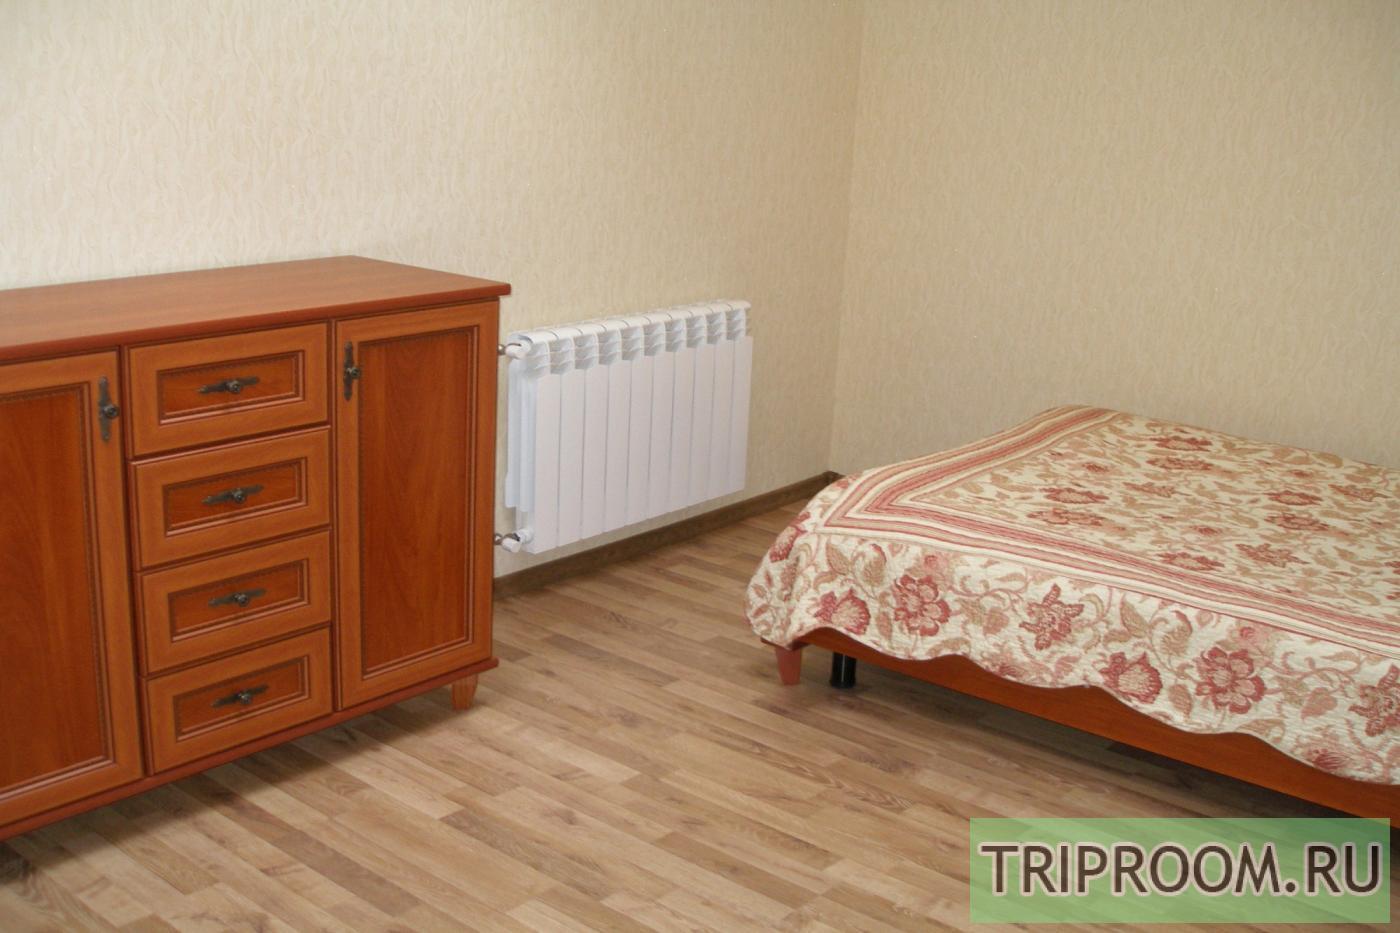 3-комнатная квартира посуточно (вариант № 34537), ул. Чехова улица, фото № 12